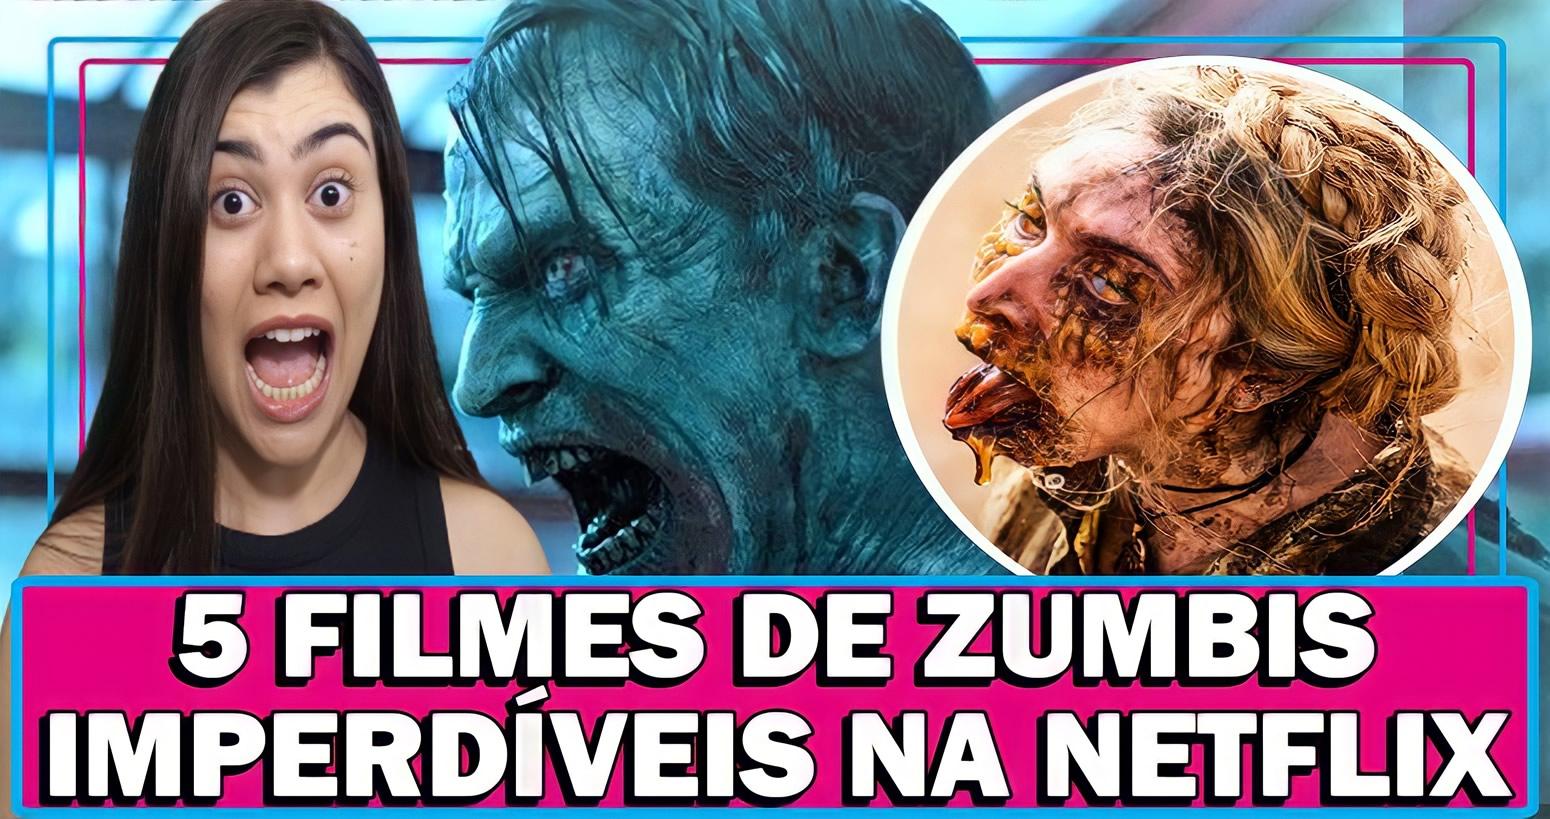 5 FILMES IMPERDÍVEIS DE ZUMBIS NA NETFLIX